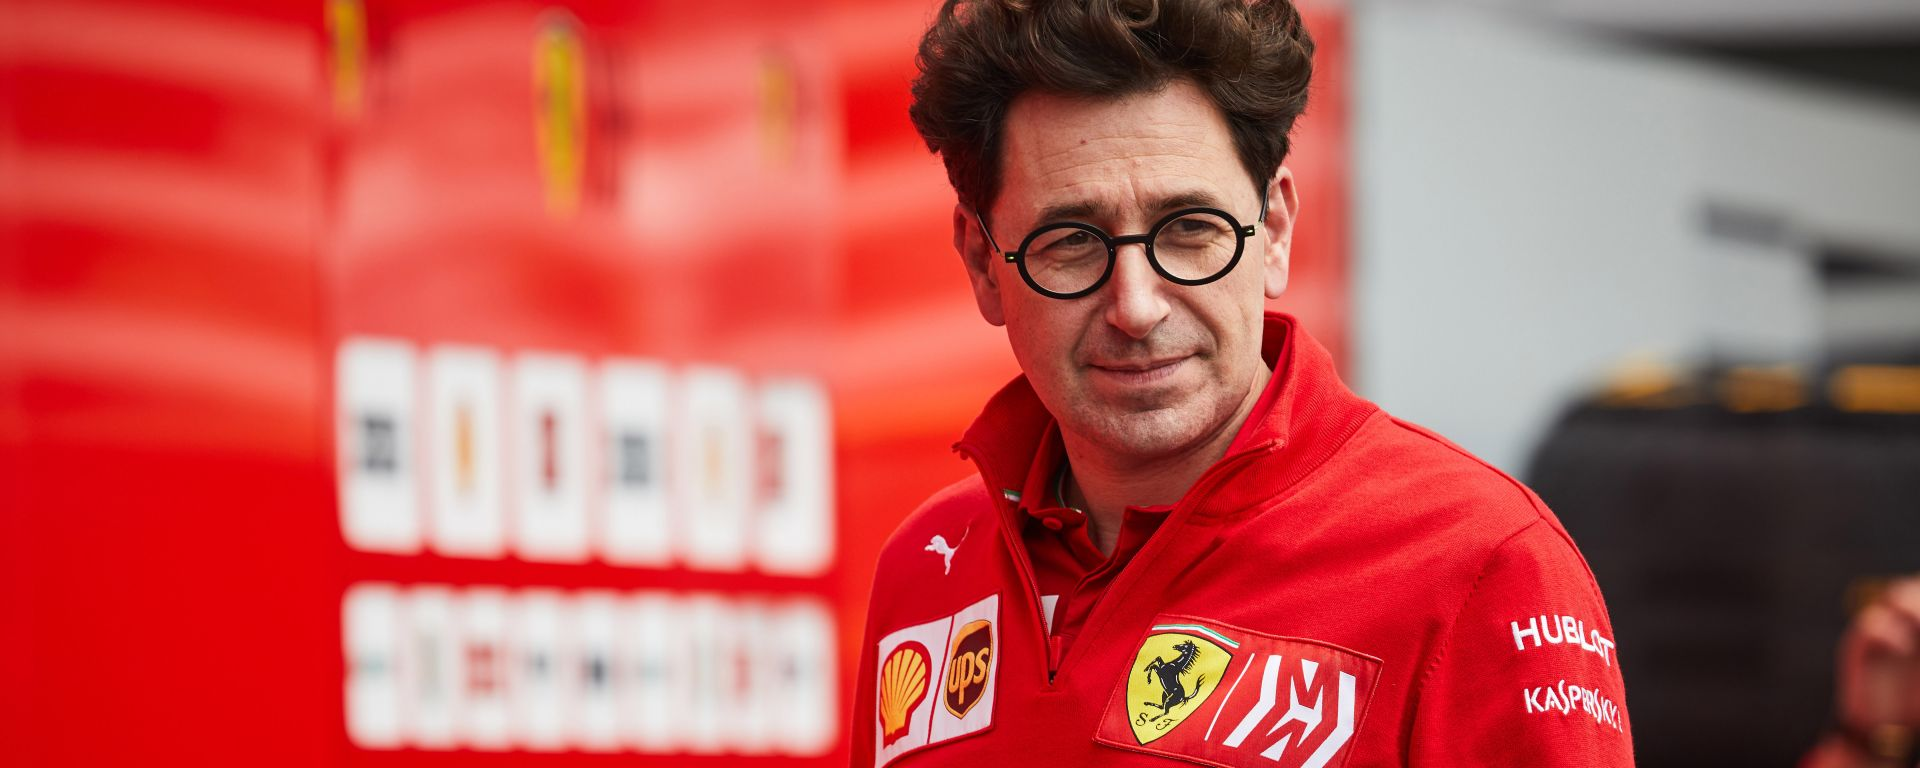 F1 2019: Mattia Binotto (Ferrari)